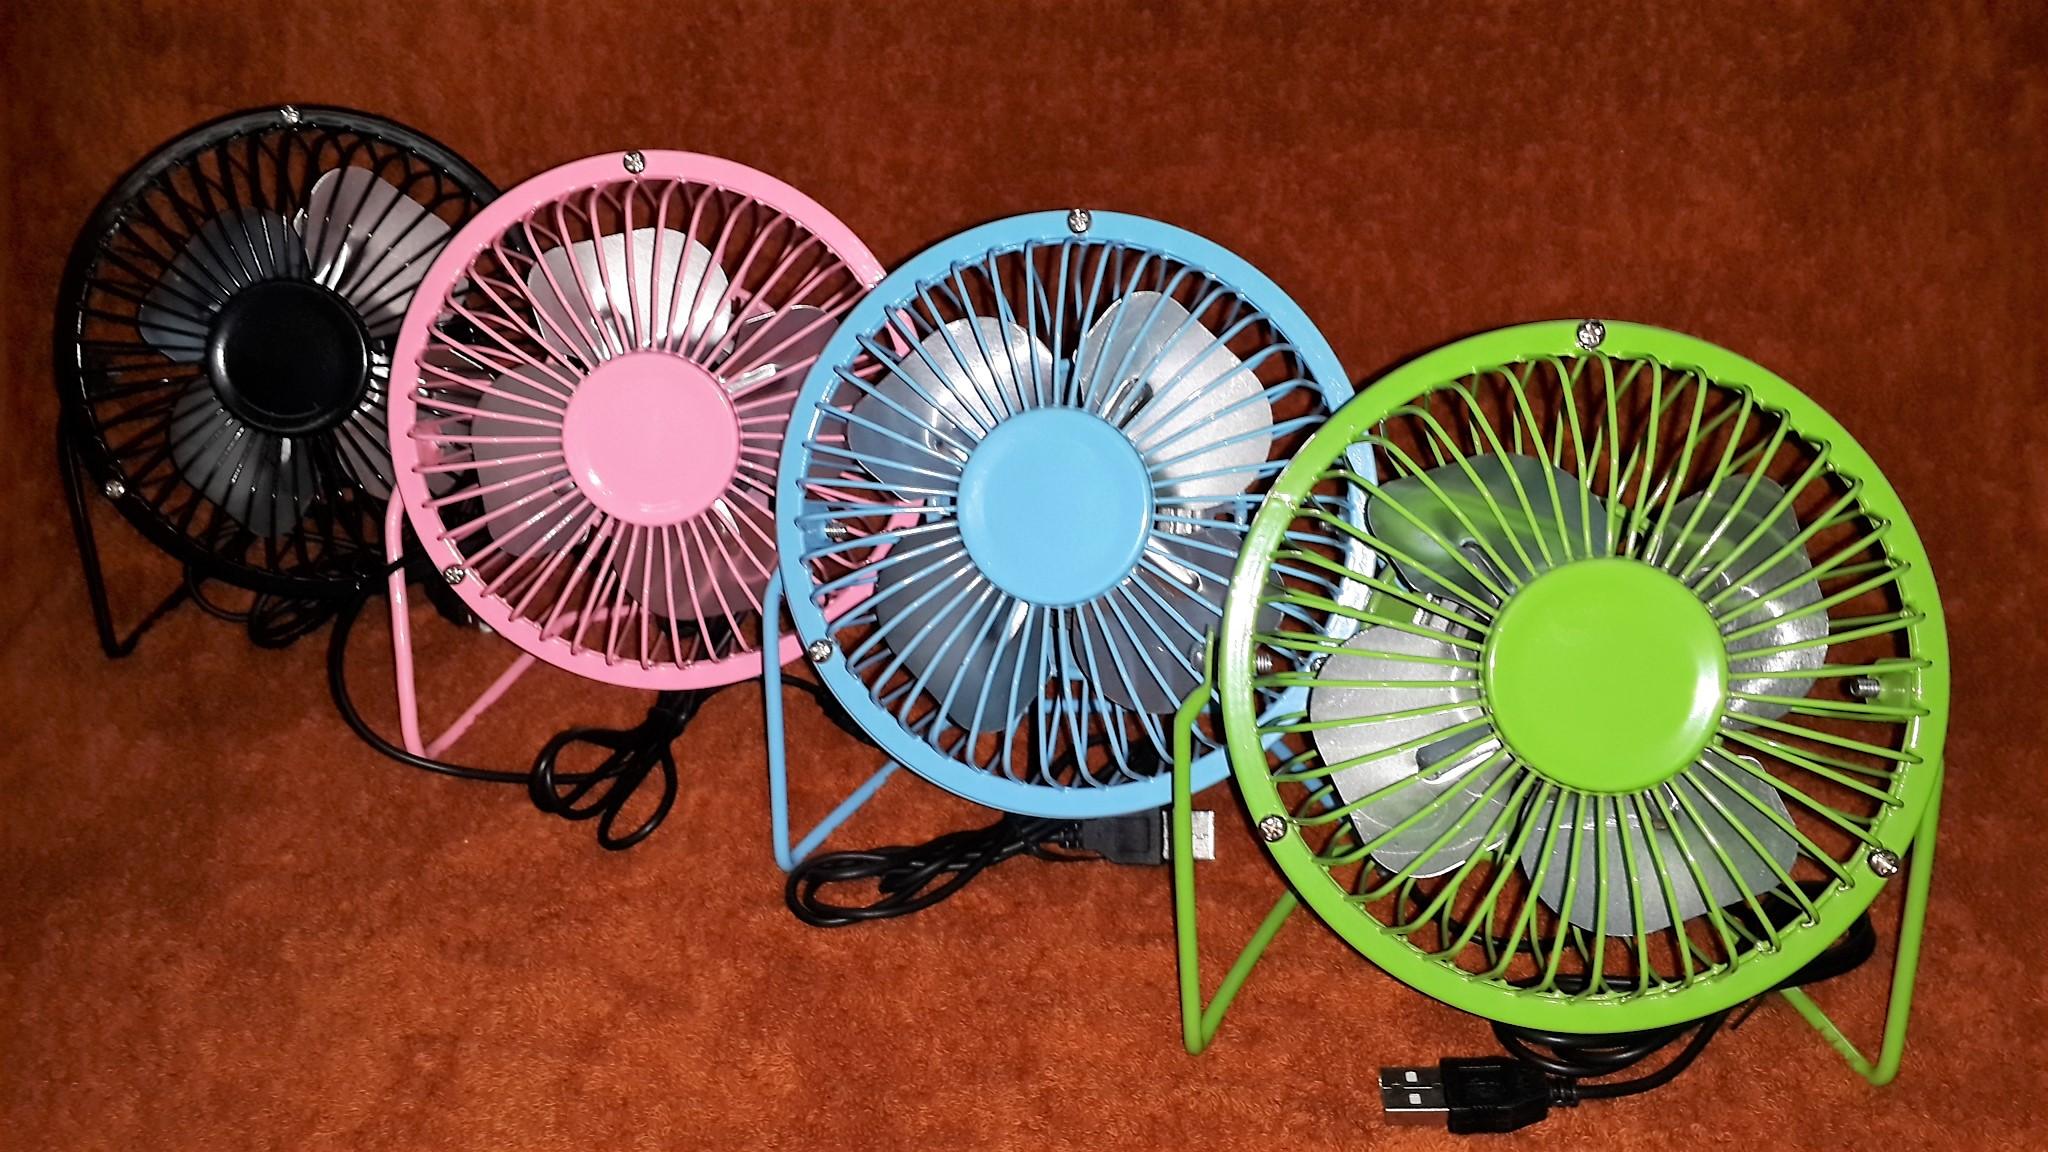 Lvling Kipas Angin Usb Besi Portable Biru Daftar Harga Terlengkap Mini Fan Gagang Jual Bahan Murah Cooling